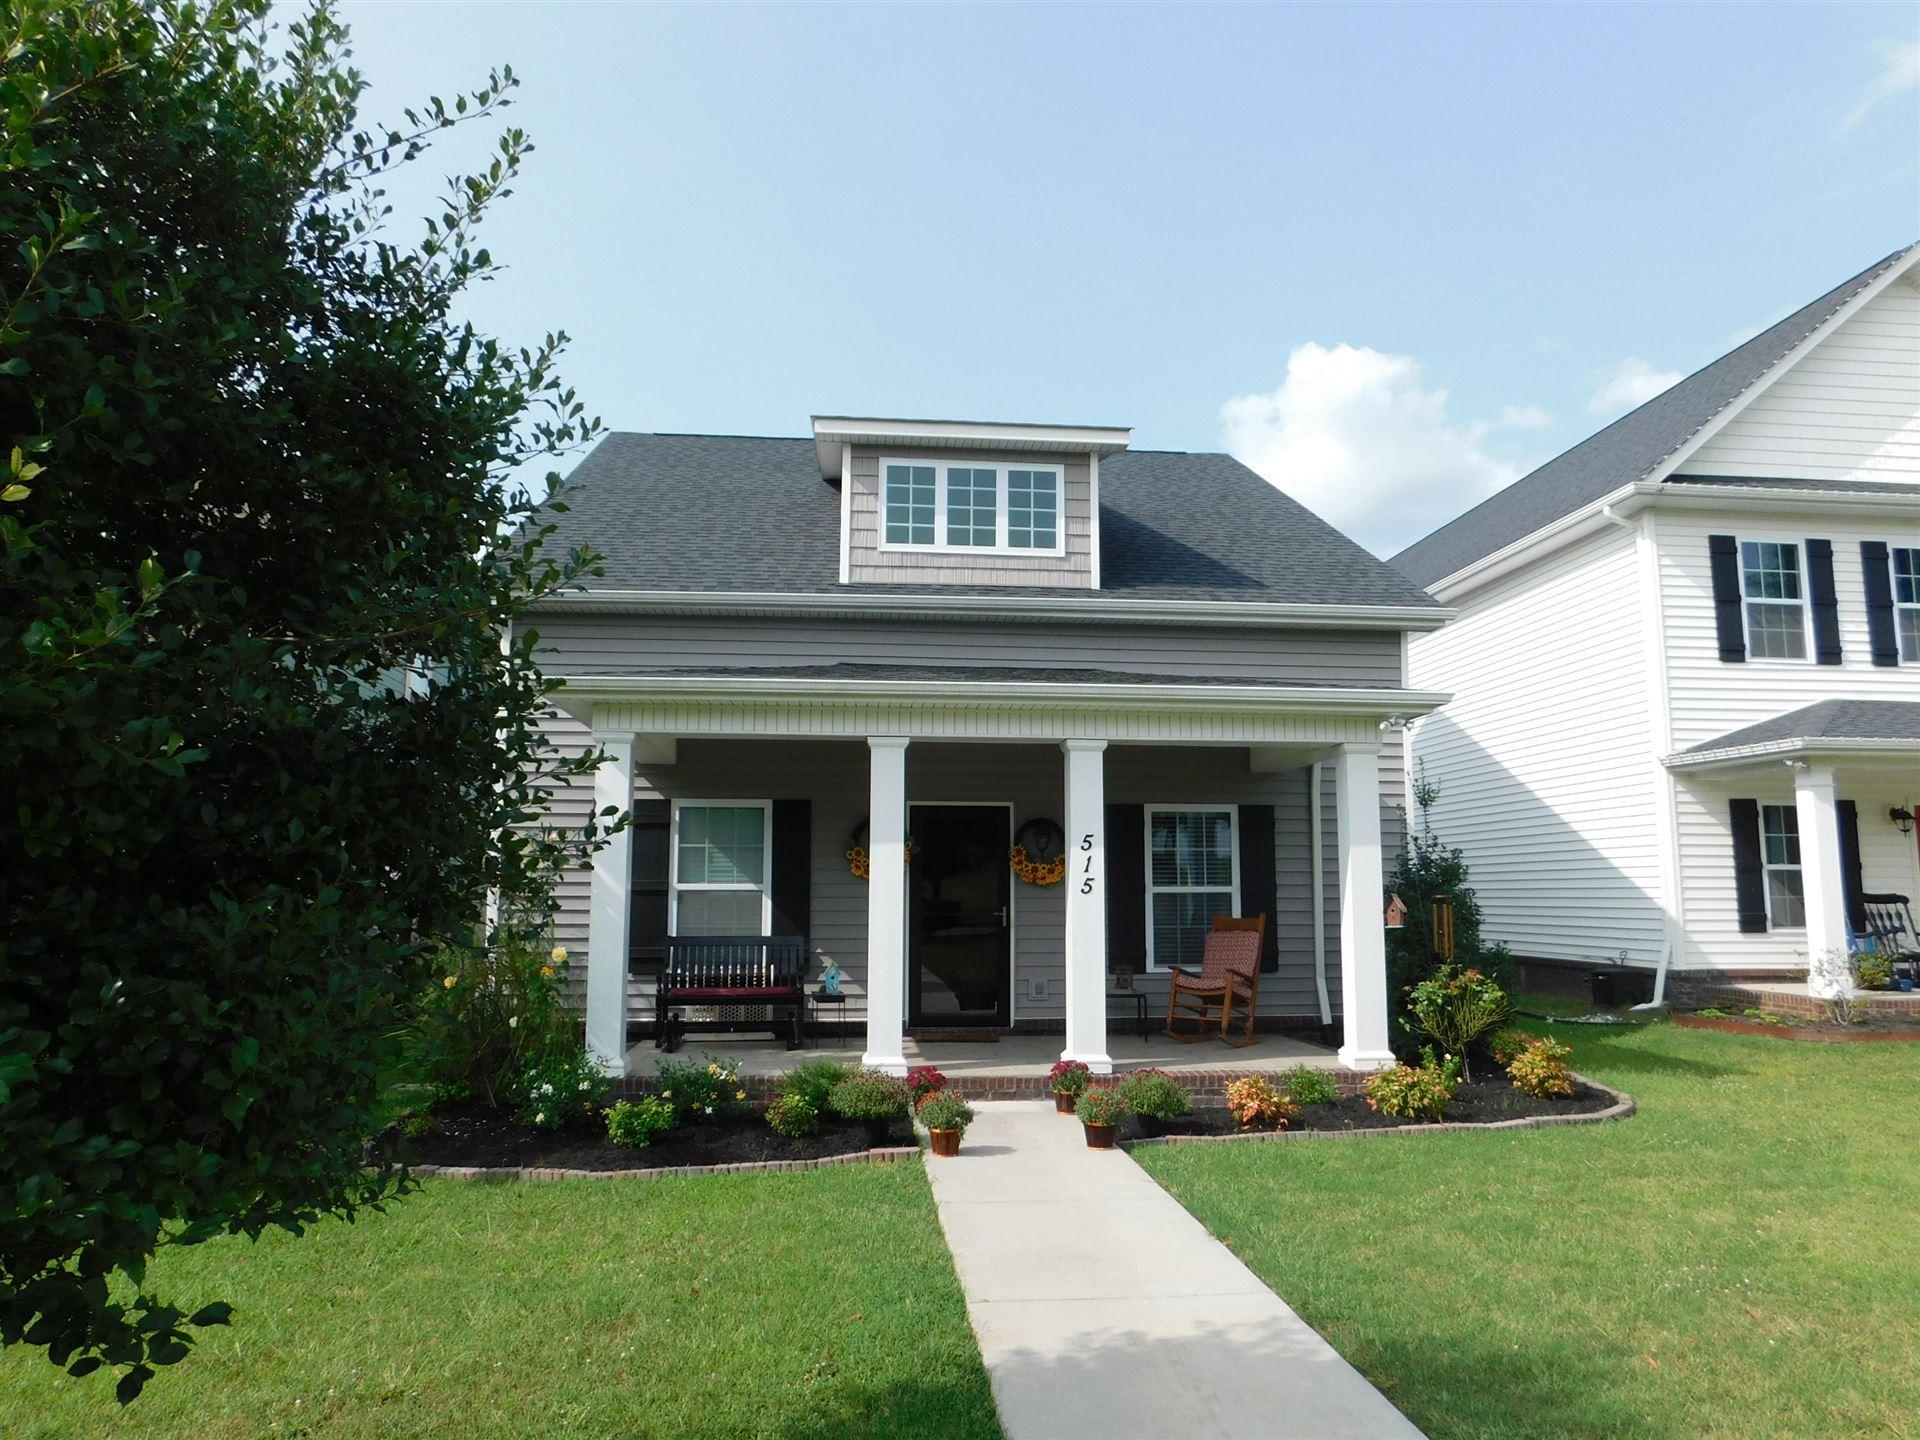 Photo of 515 Broadberry Ave, Oak Ridge, TN 37830 (MLS # 1132746)